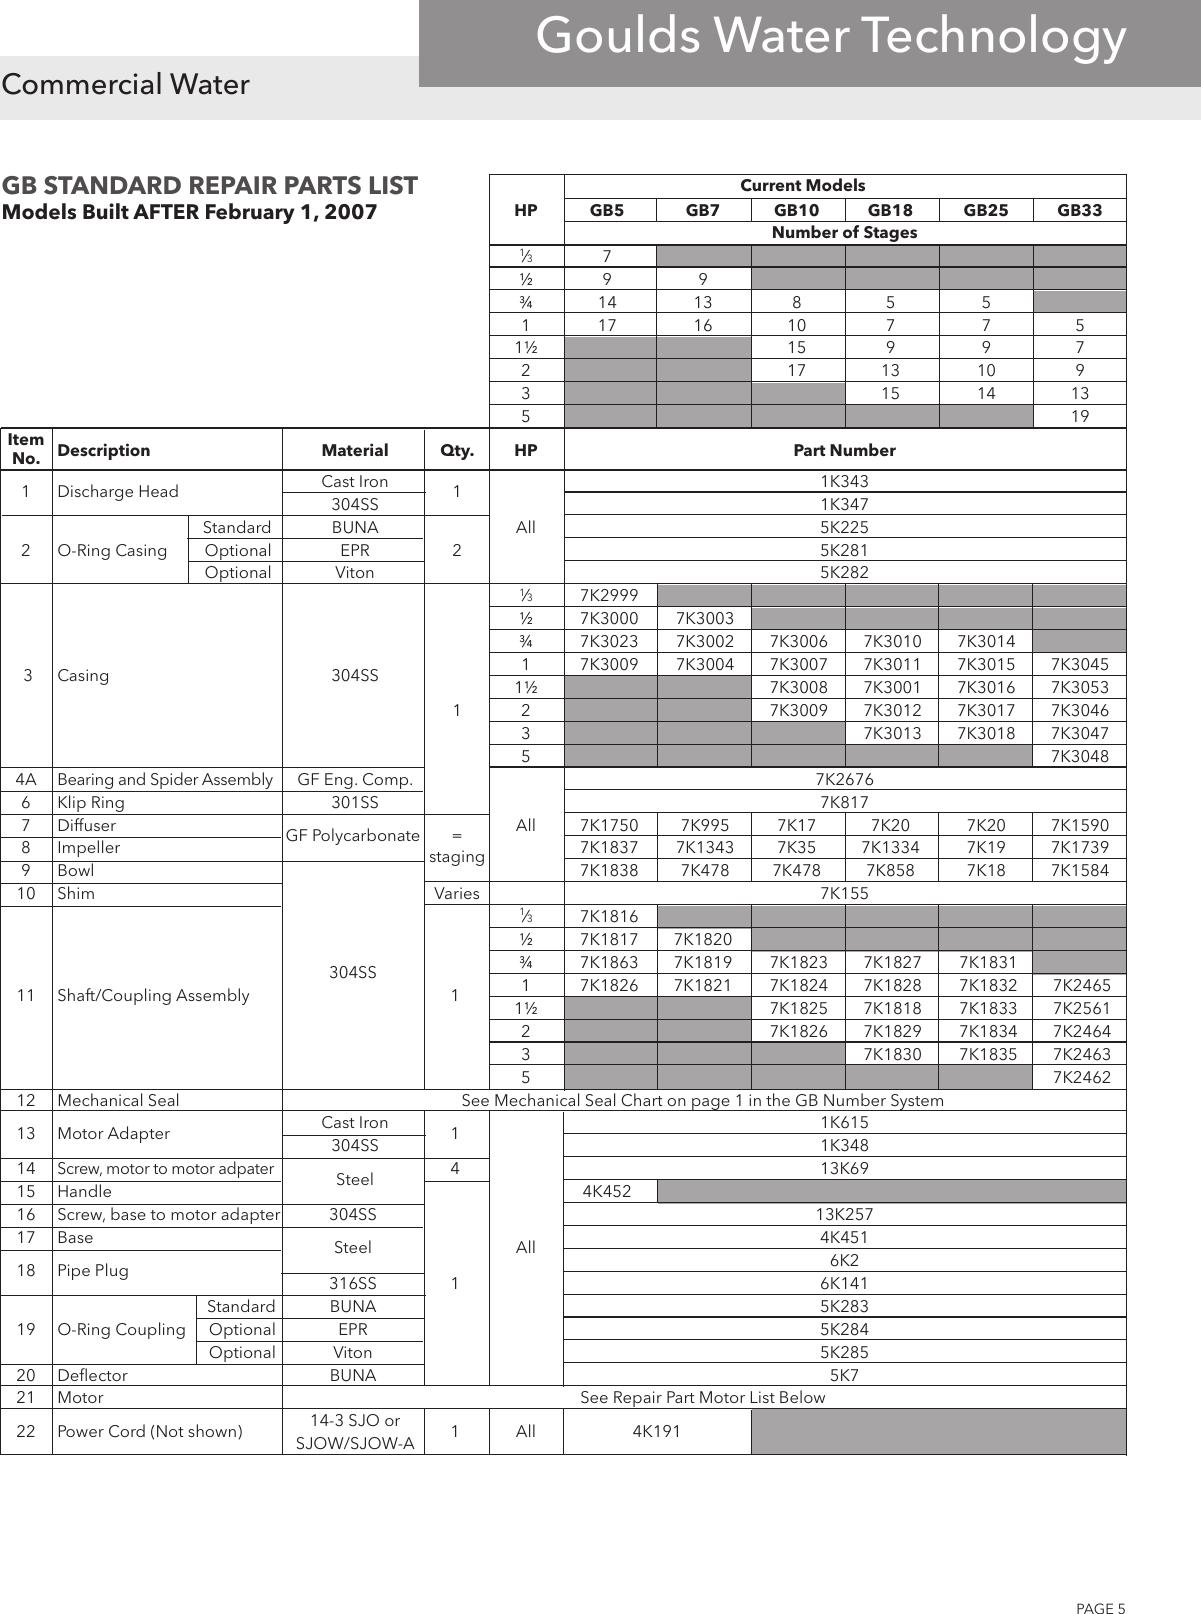 540520 4 Goulds GB Series Reair Parts List on